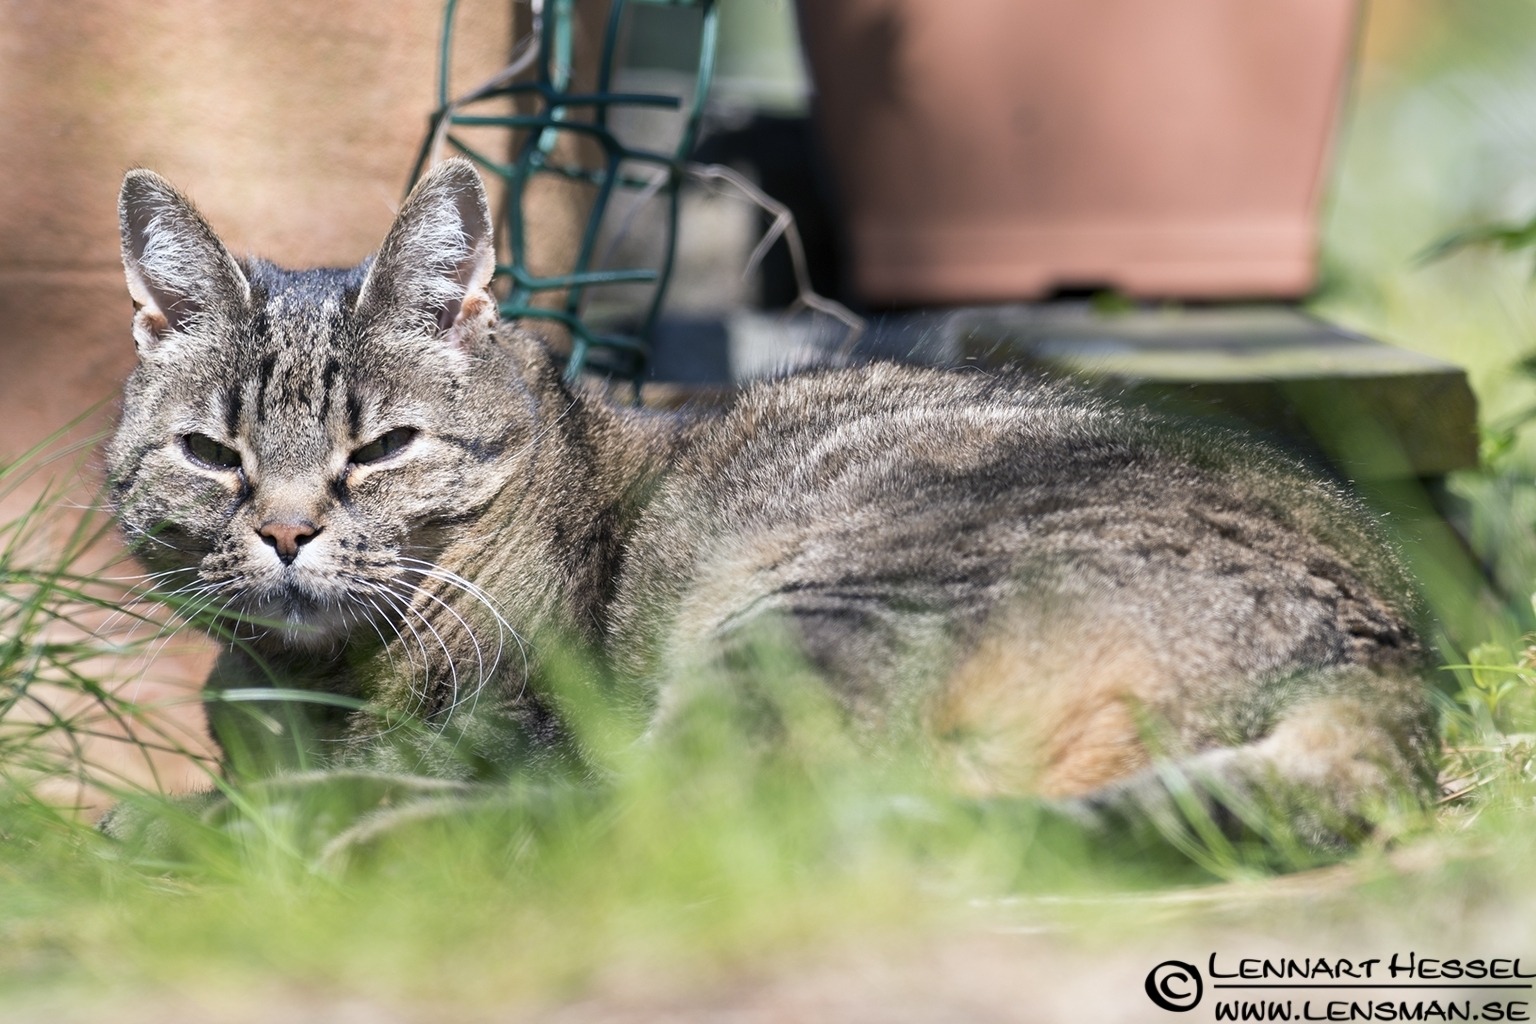 Hokus the cat lazy